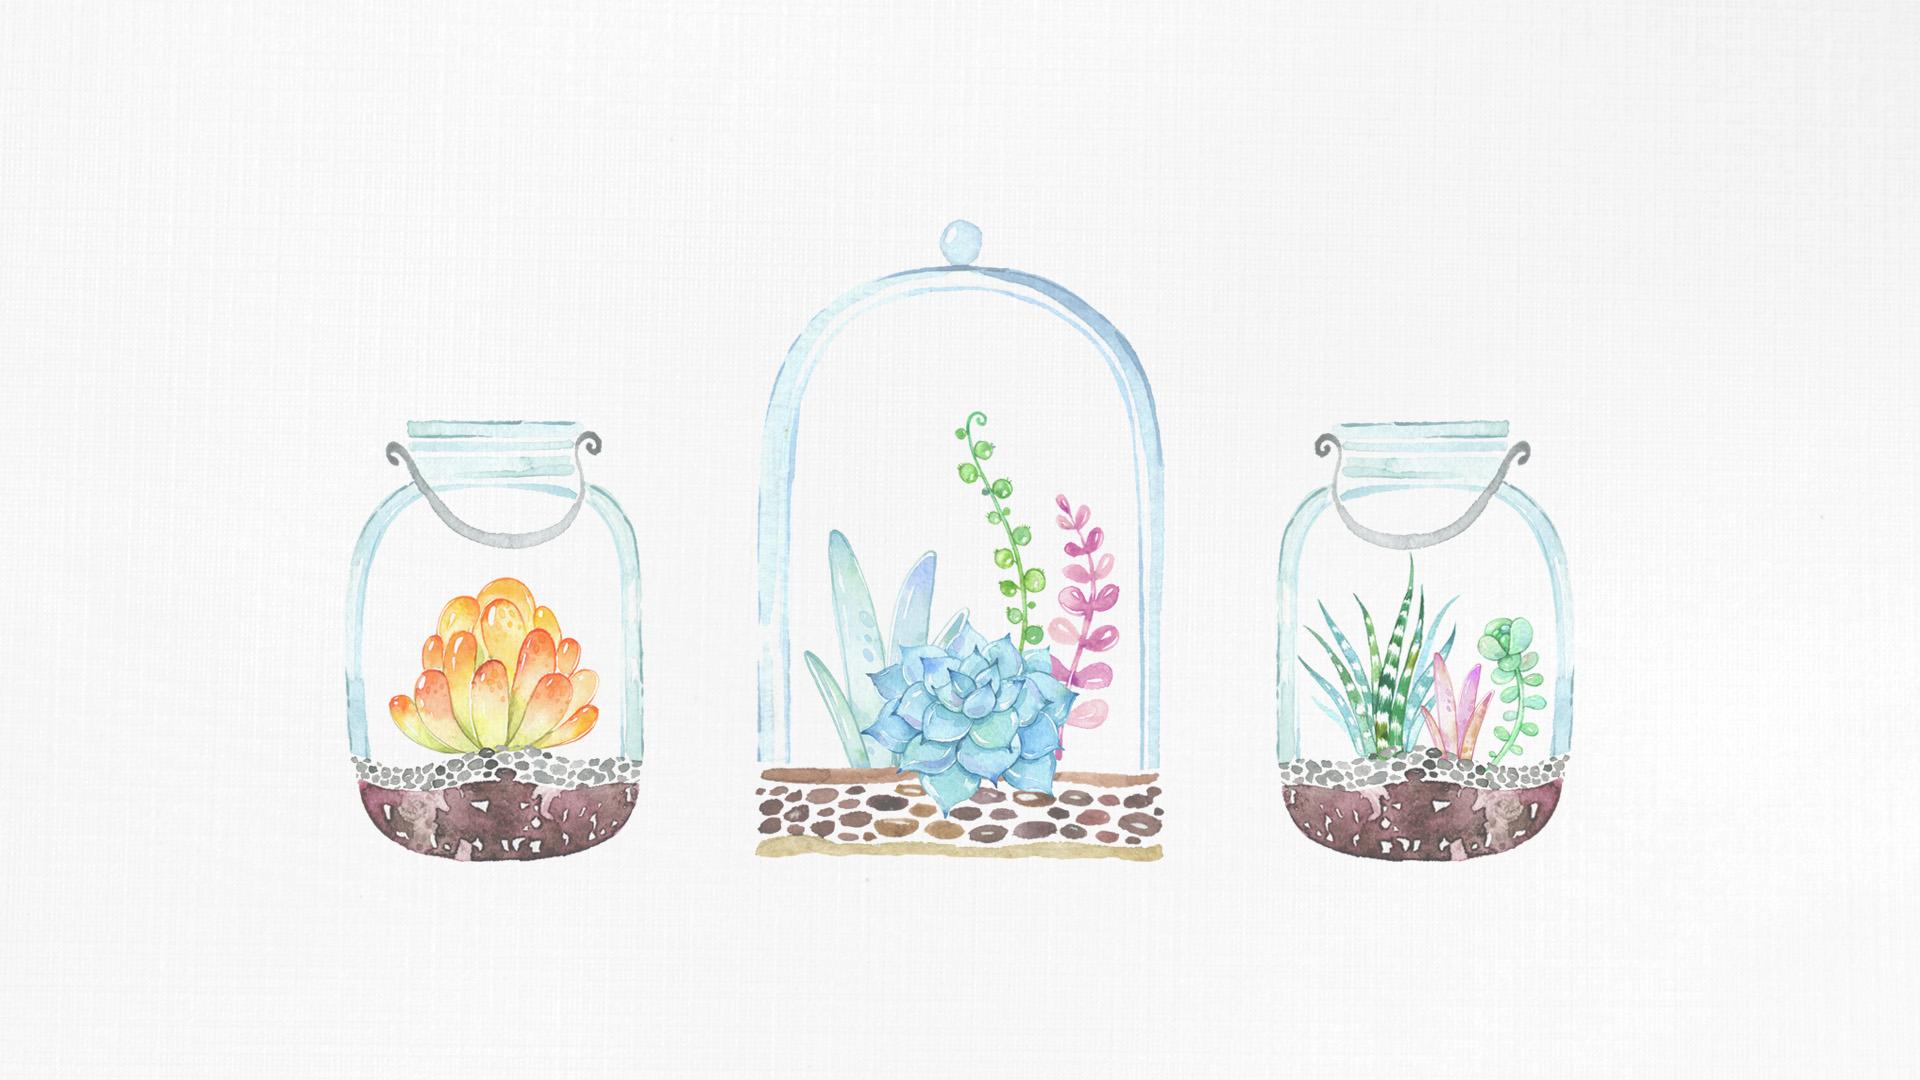 Love Jar Wallpaper : Free Desktop Wallpaper /// Mason Jar Succulents - The ...